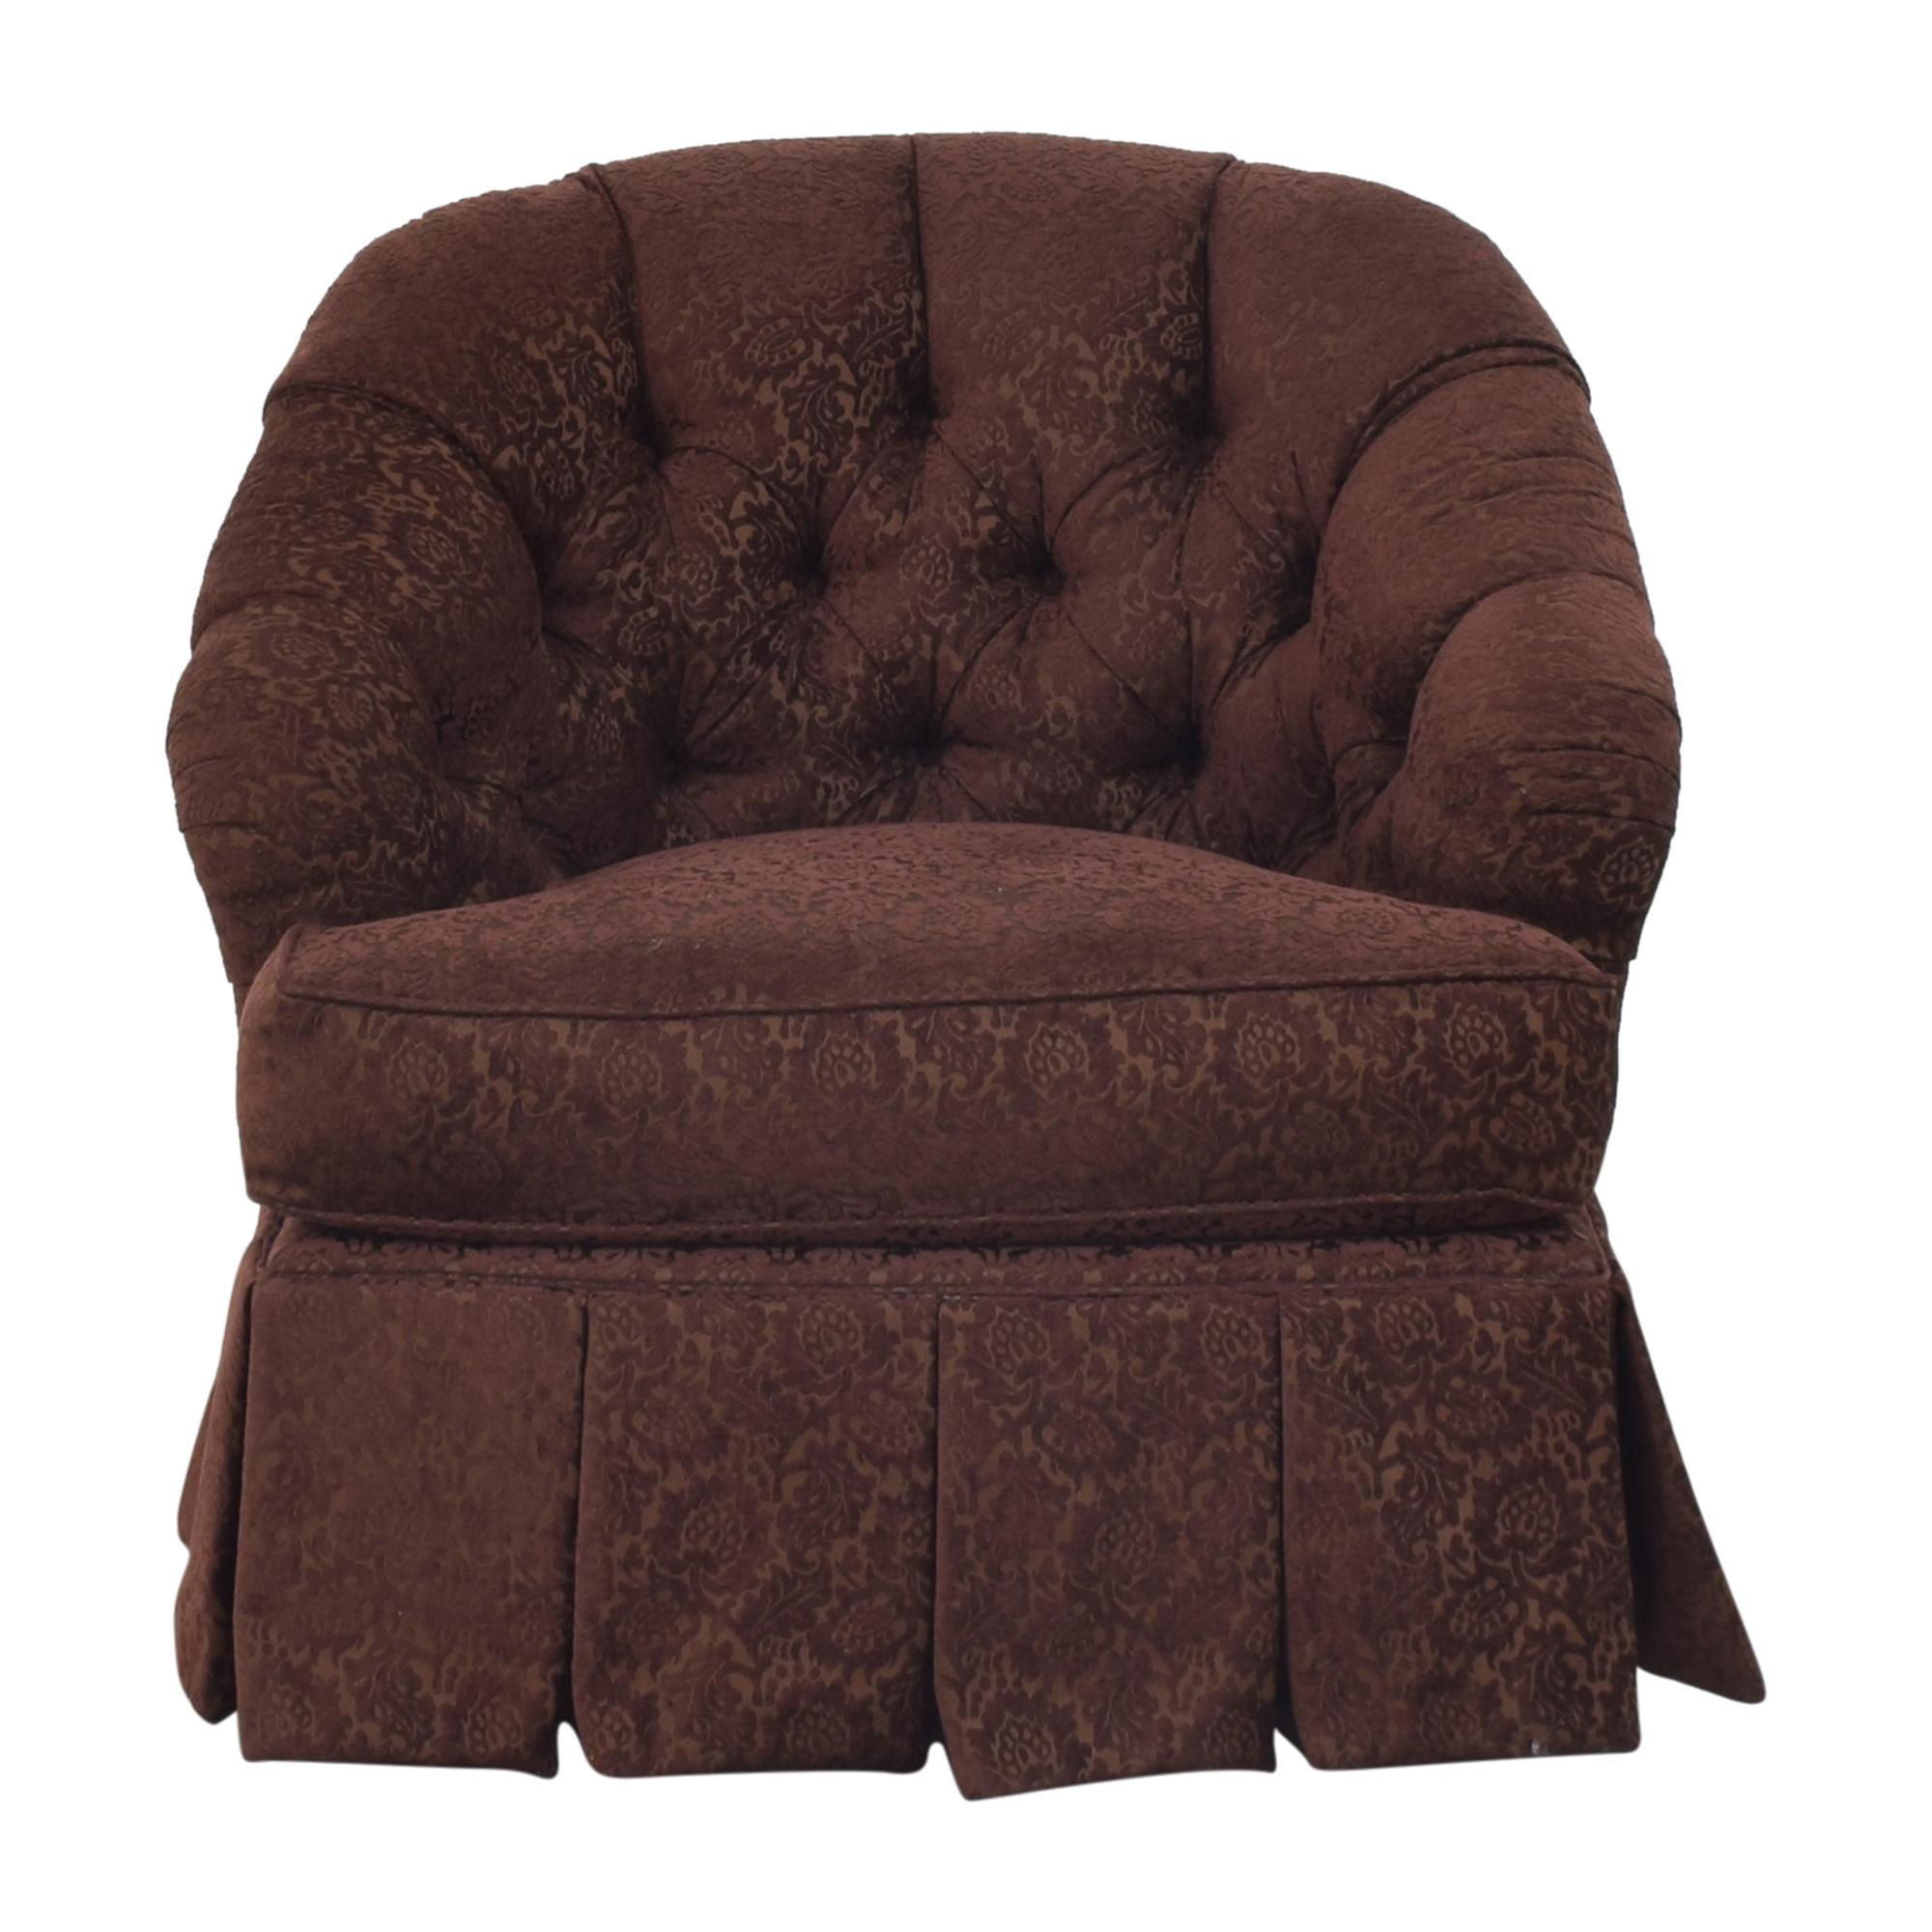 Ethan Allen Ethan Allen Diamond Tufted Swivel Chair nj